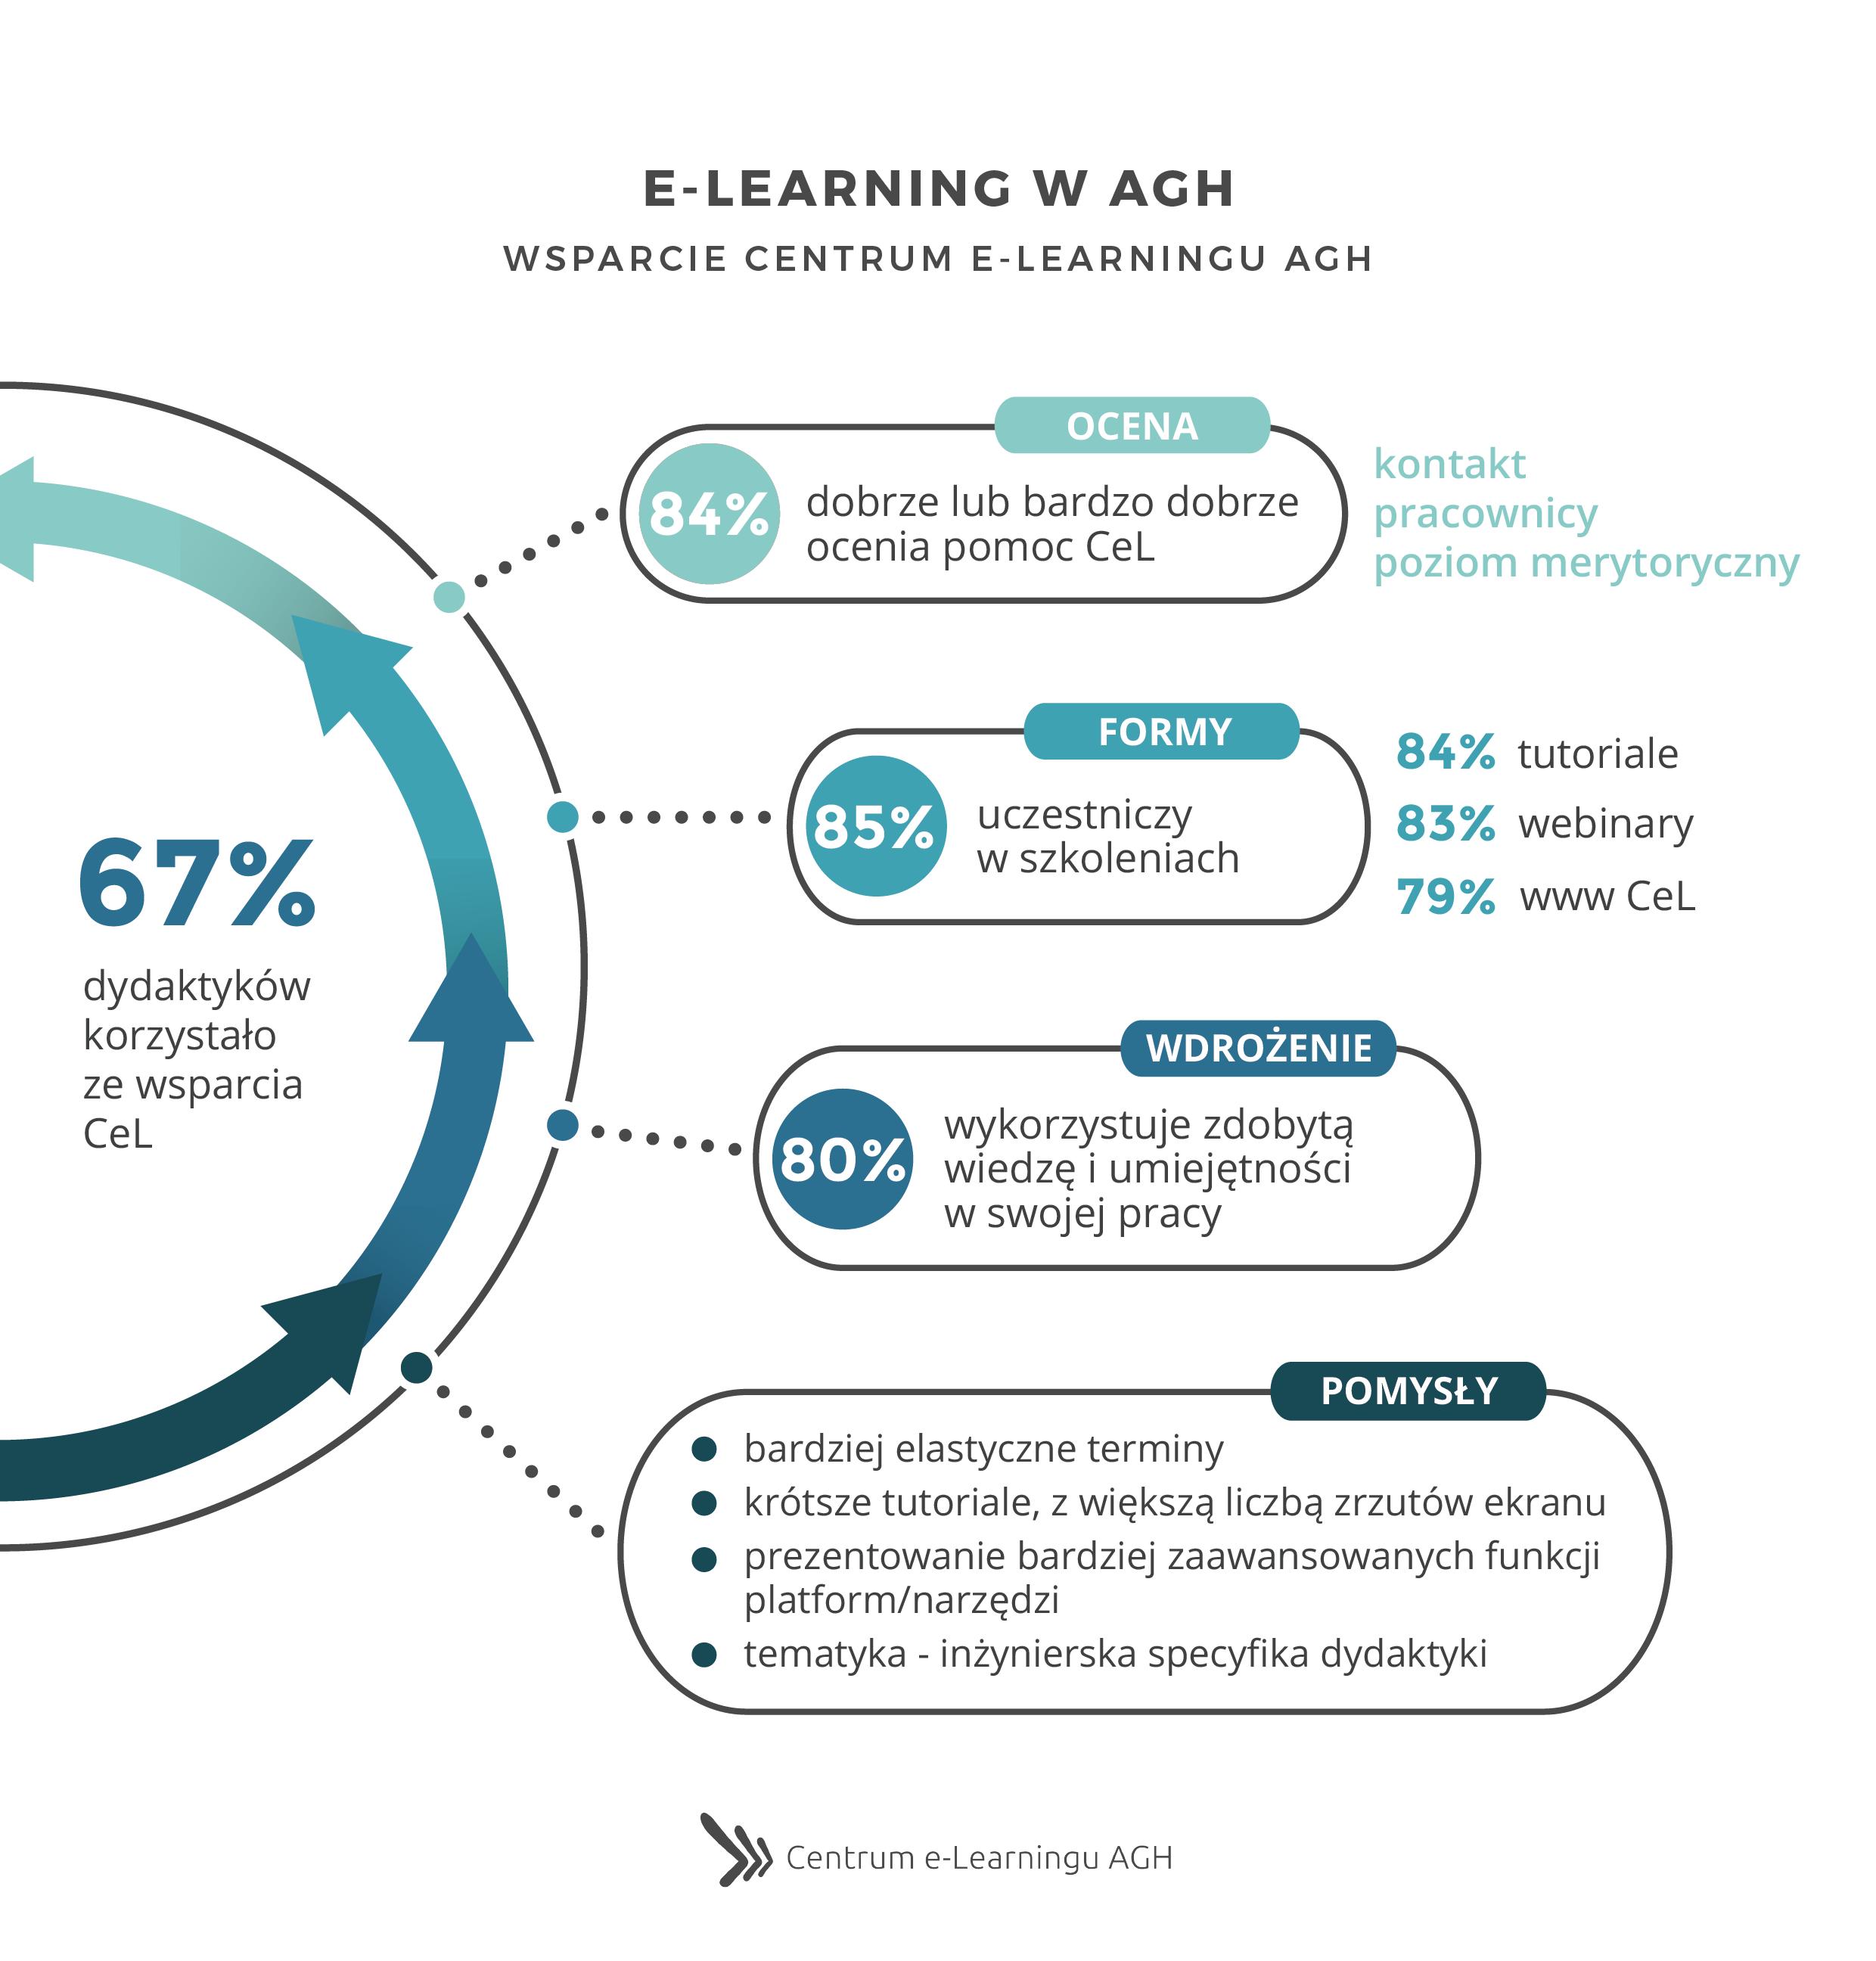 e-Learning w AGH - Wsparcie Centrum e-Learningu AGH